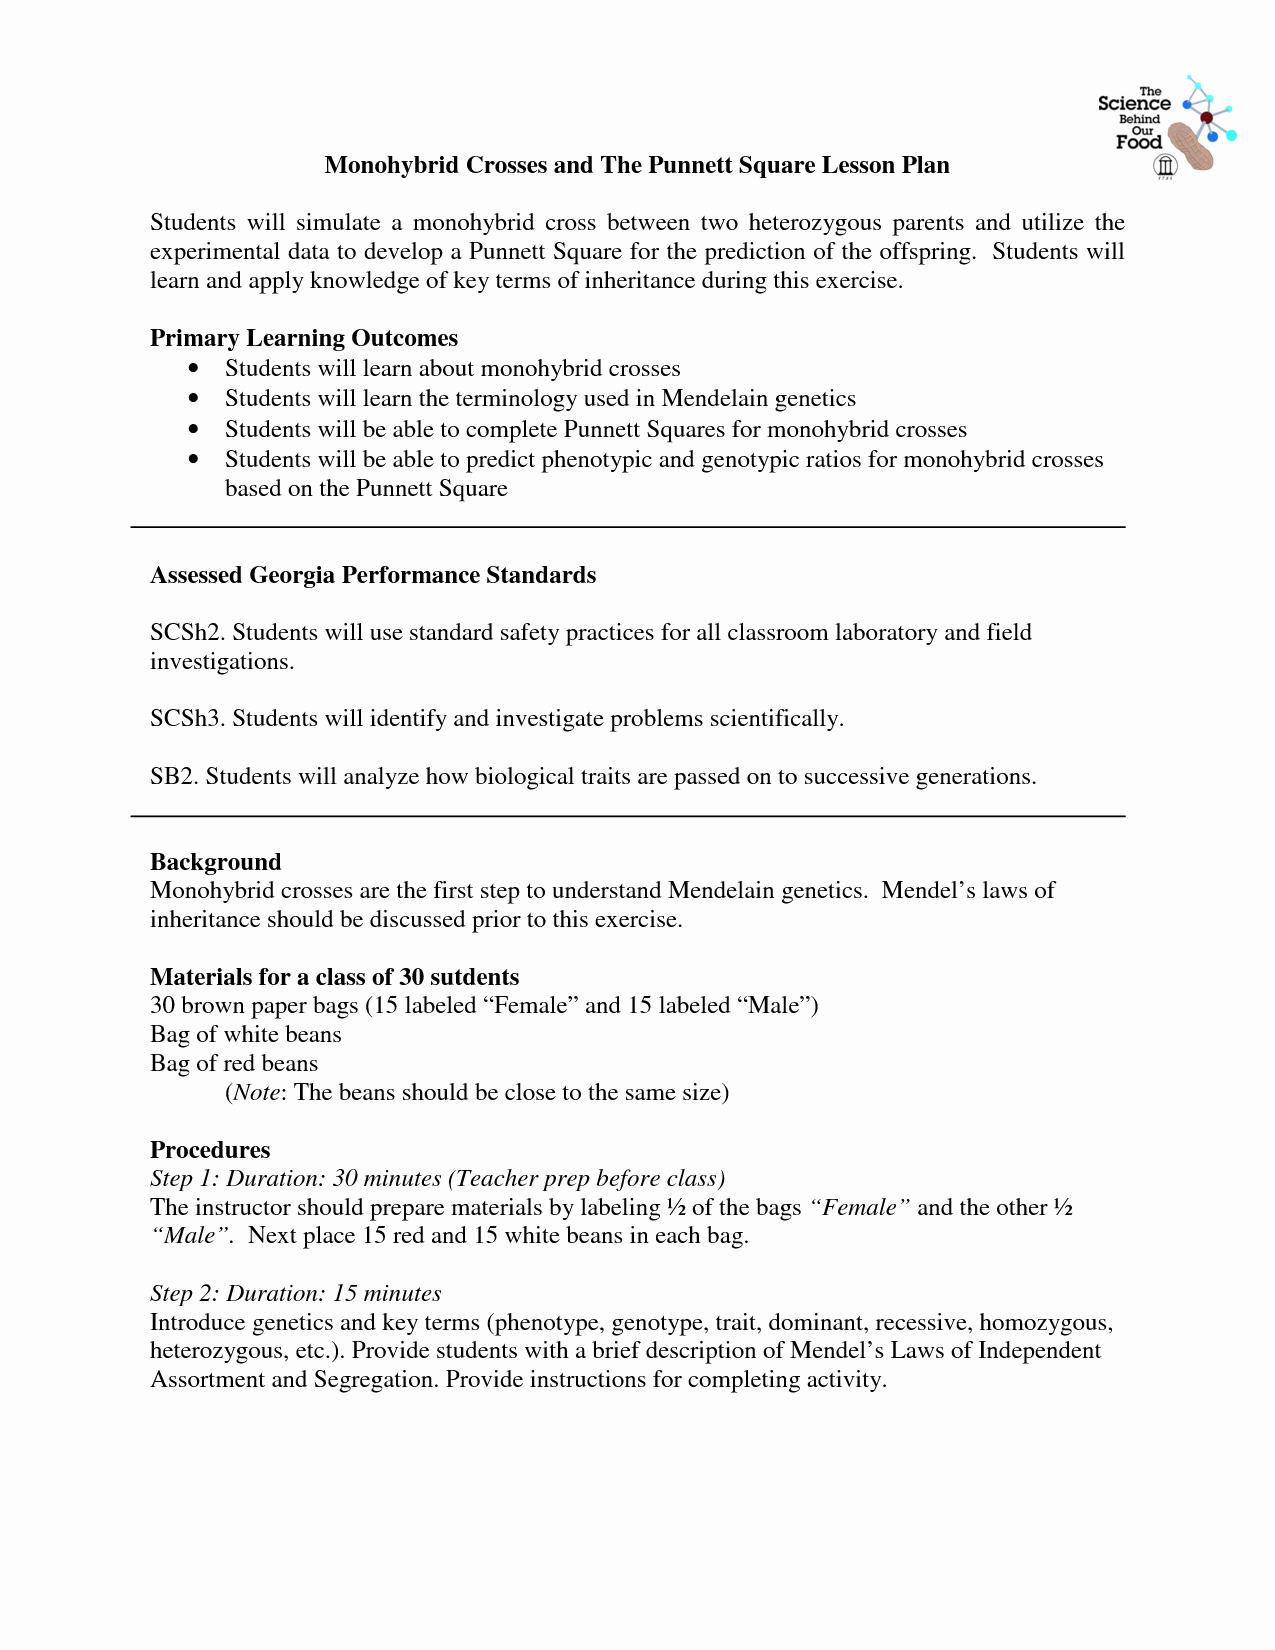 Monohybrid Cross Worksheet Answers Best Of 14 Best Of Monohybrid Cross Worksheet Answer Key